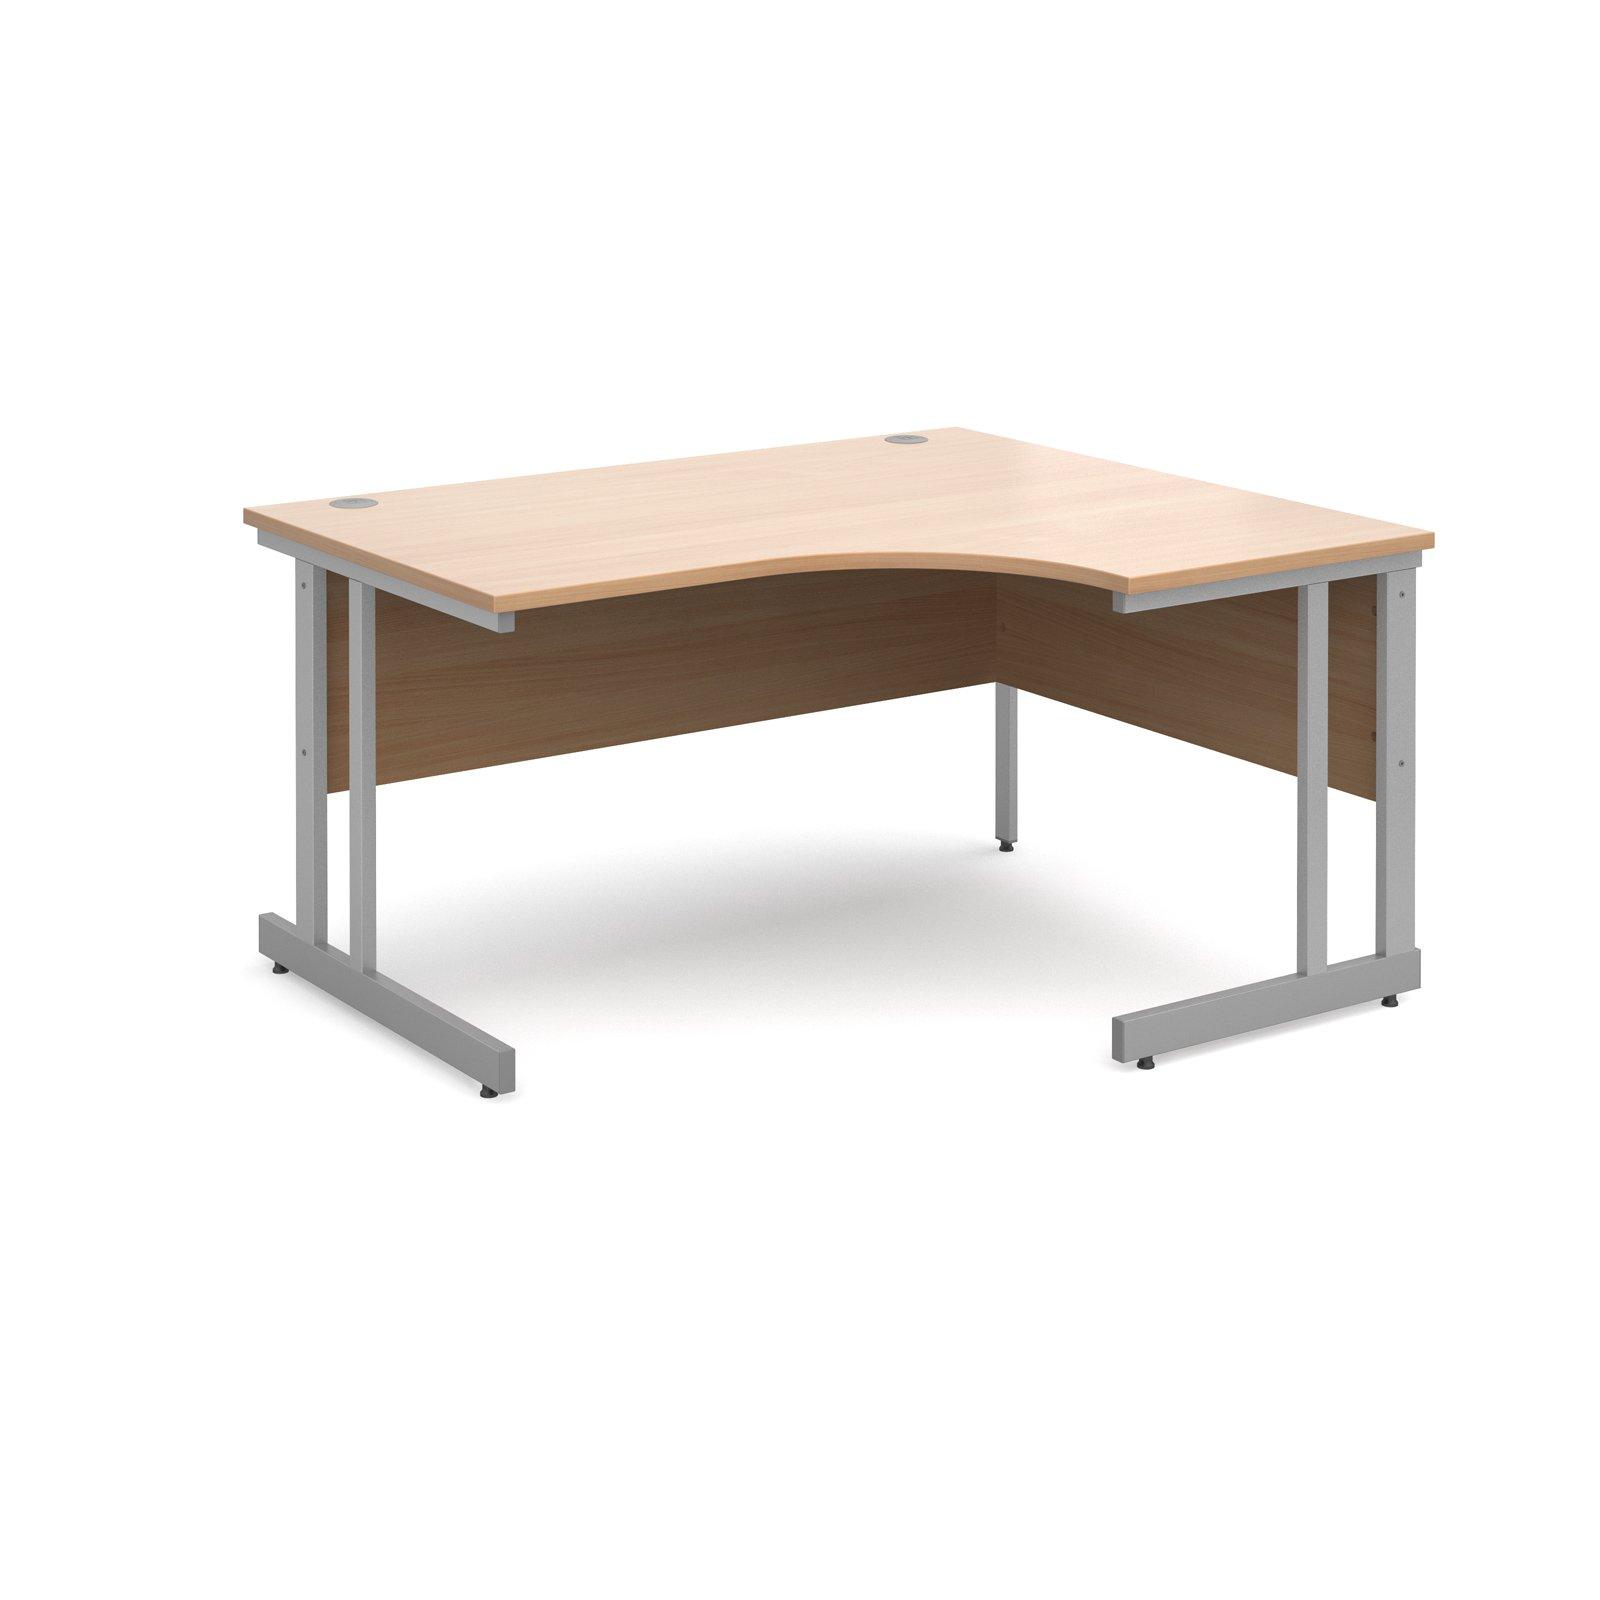 Momento right hand ergonomic desk 1400mm - silver cantilever frame, beech top